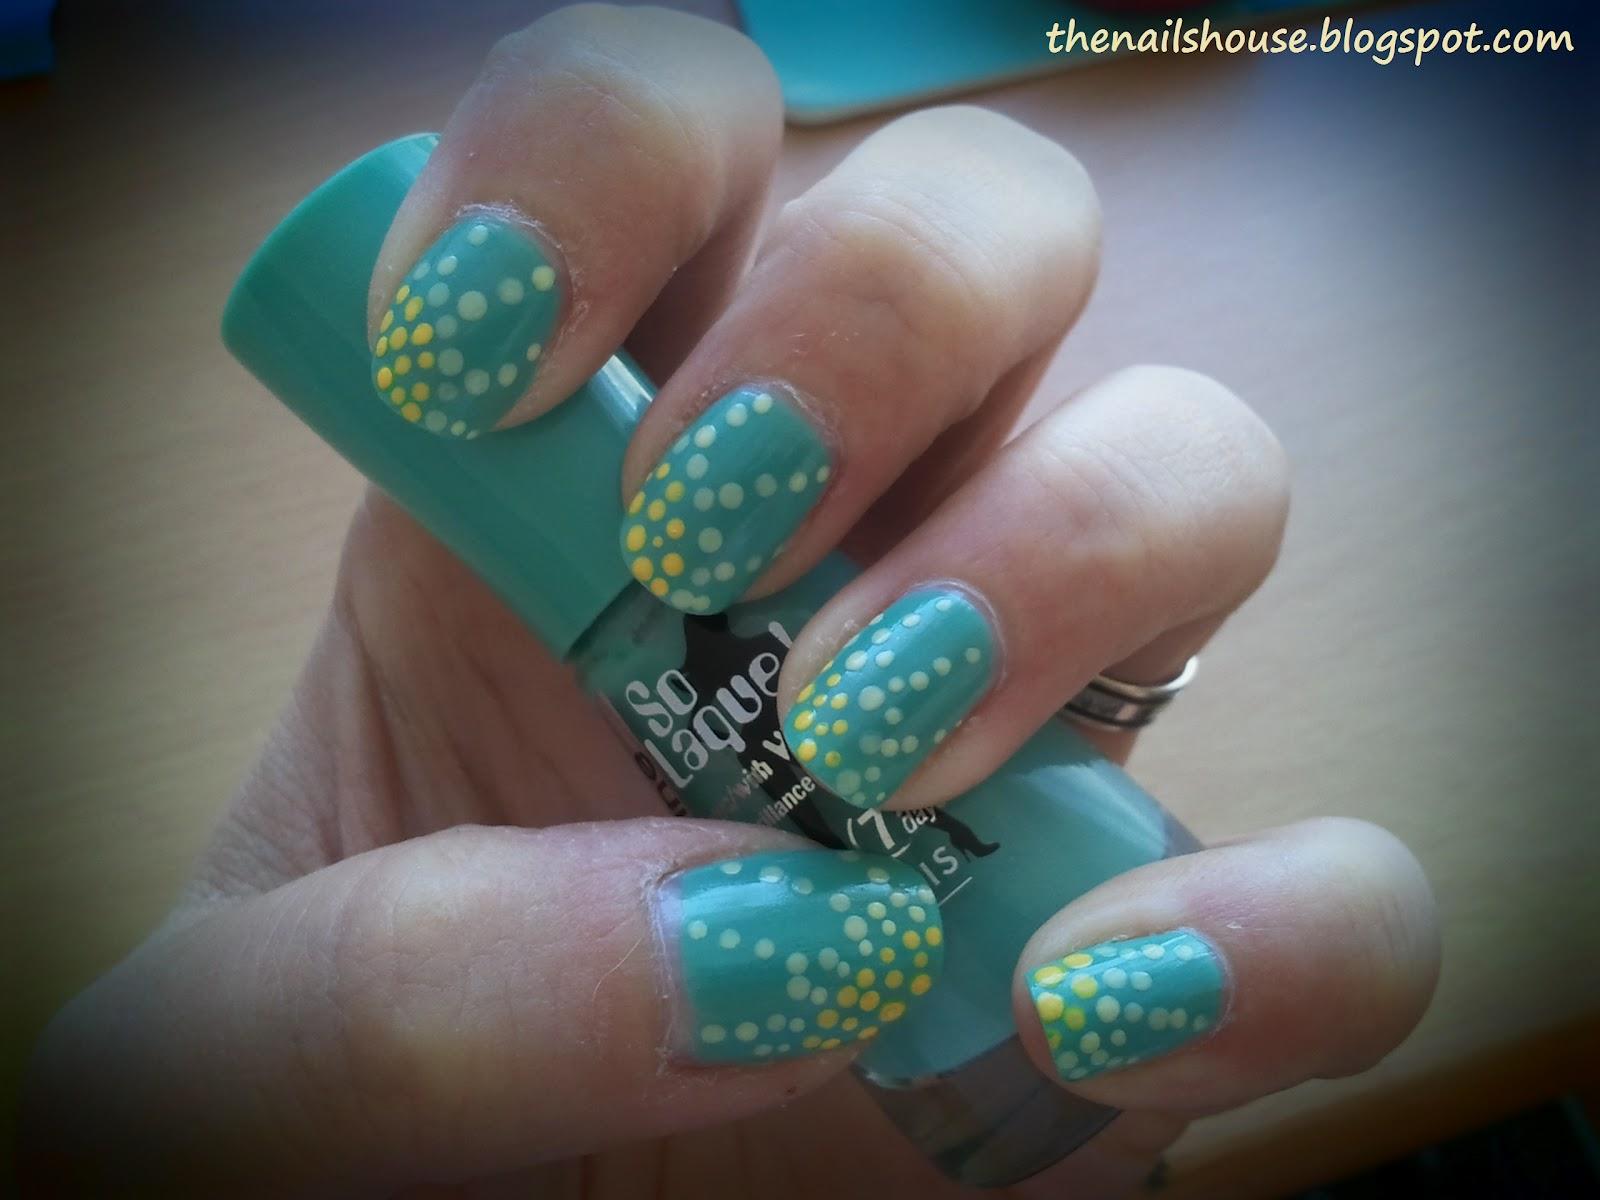 Nail art soleil en pois bleu et jaune the nails house - Nail art bleu ...